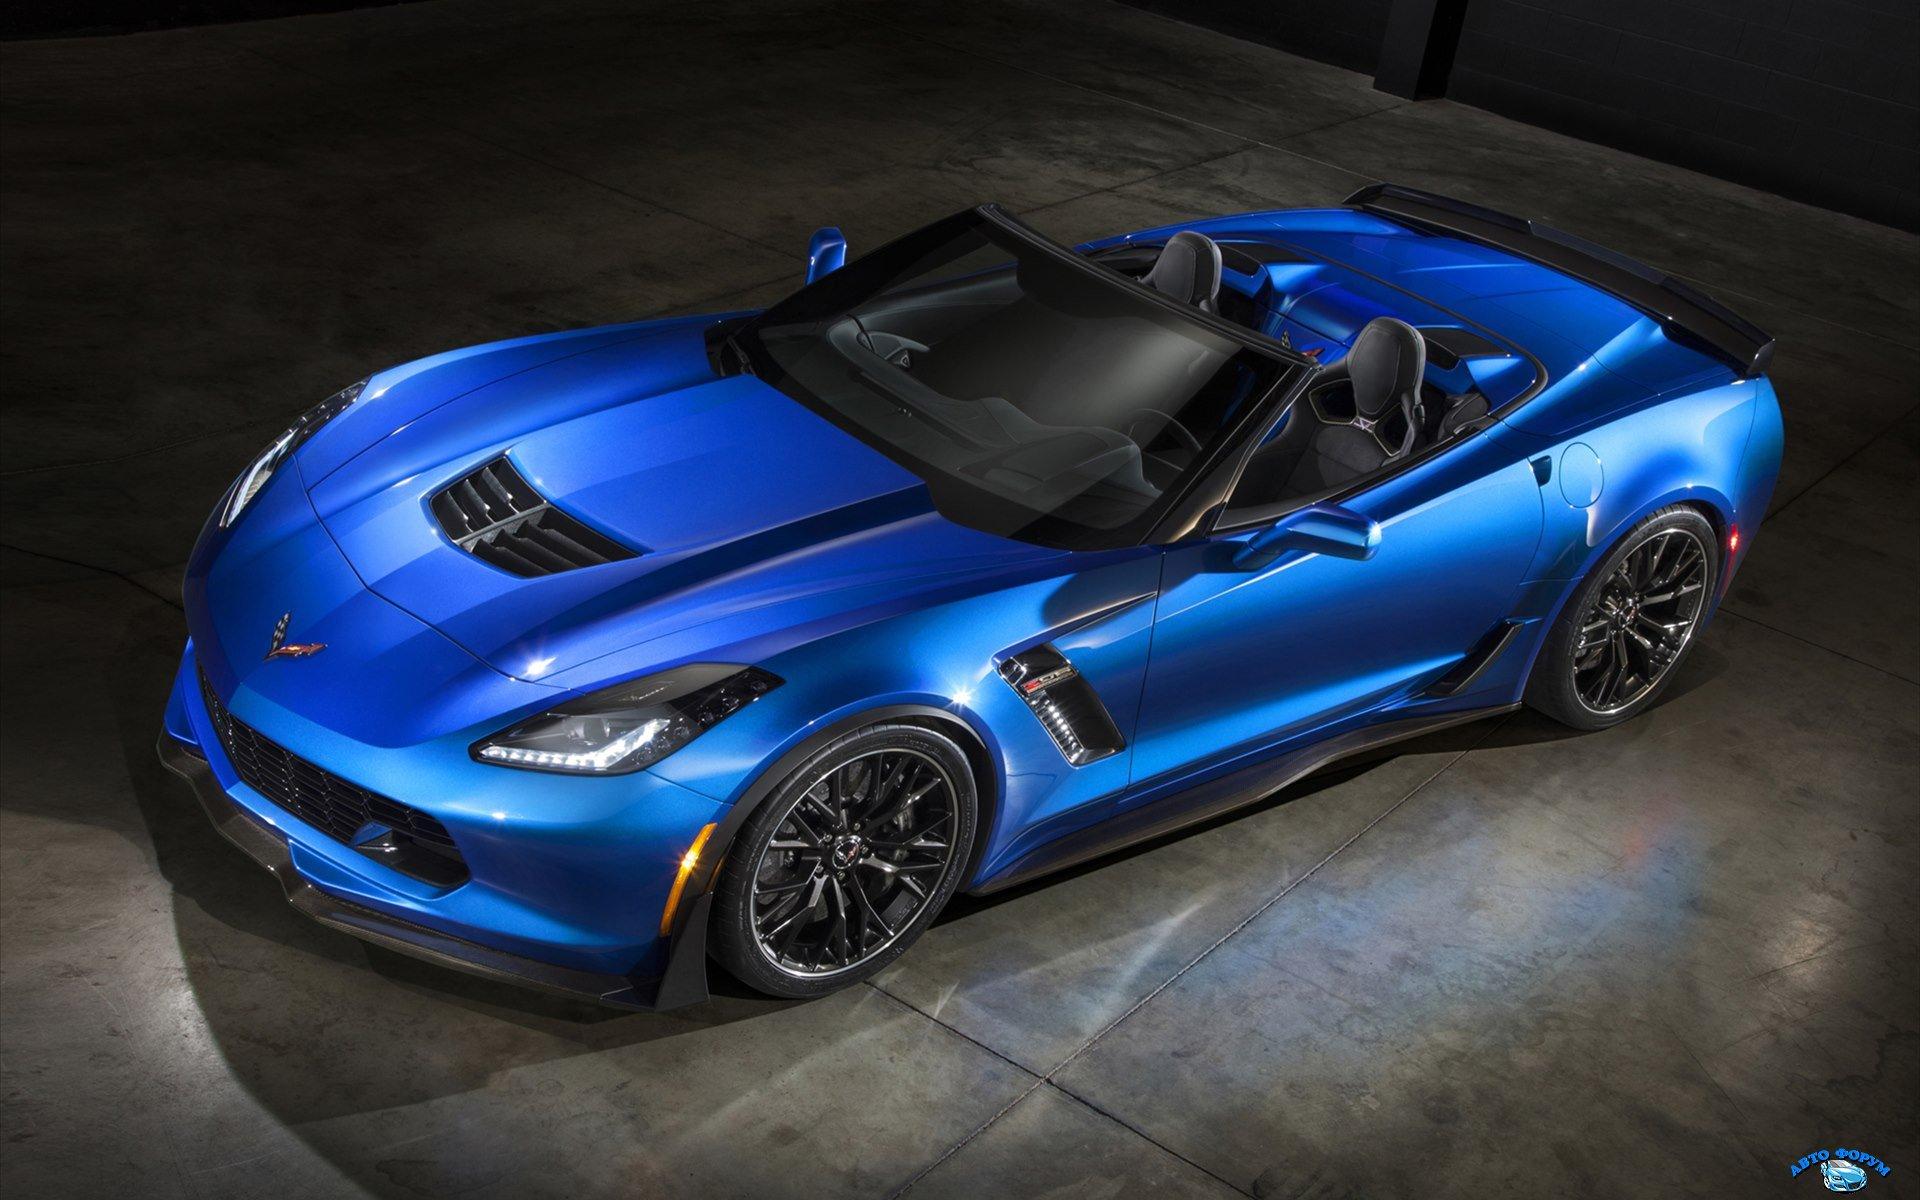 Chevrolet-Corvette-Z06-Convertible-2015-widescreen-03.jpg